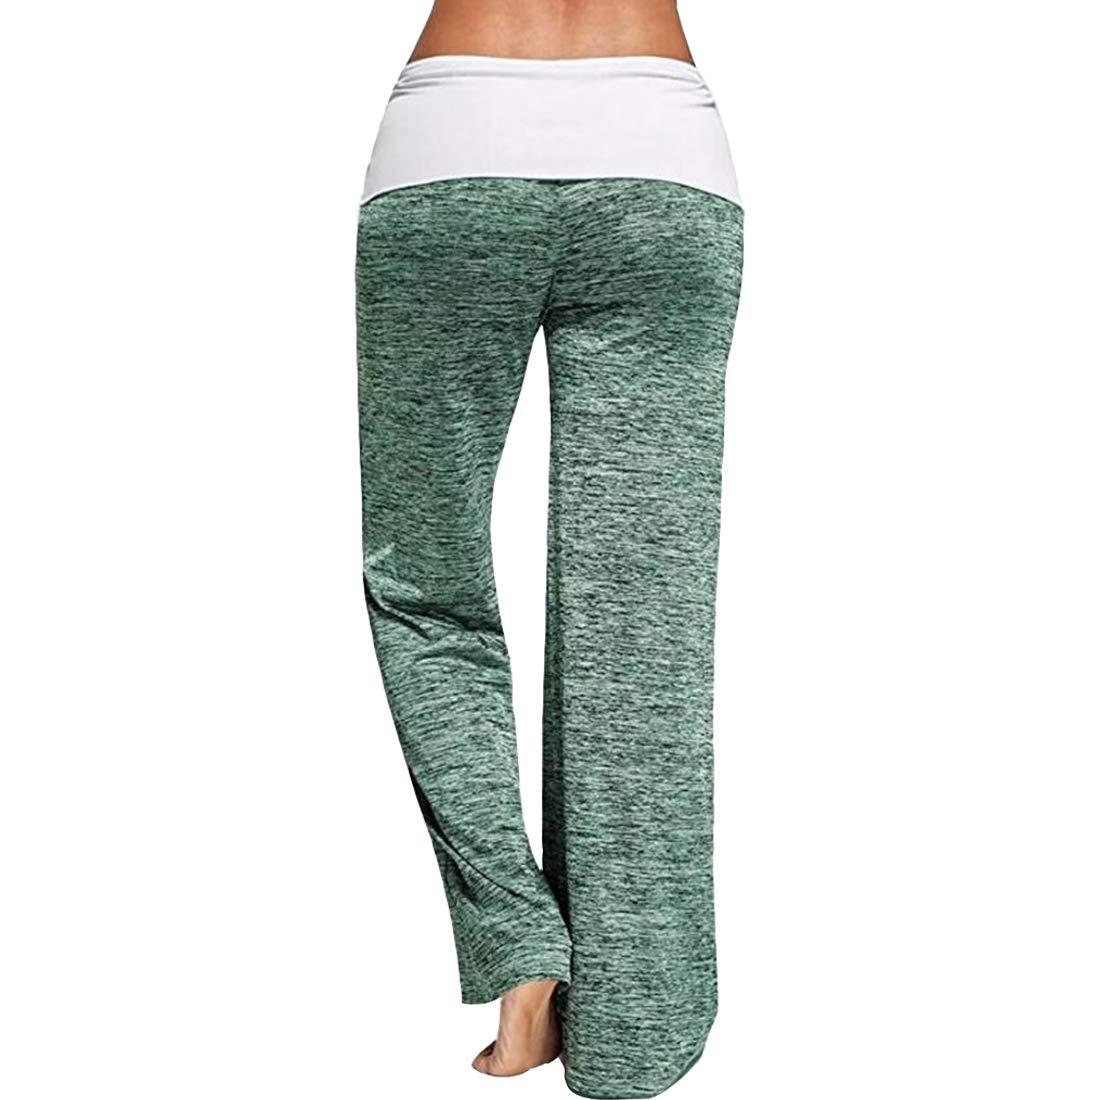 Sidiou Group Pantaloni da Yoga da Donna Pantaloni da Gamba Larghi Pantaloni da Ballo Pantaloni Sportivi da Palestra Pantaloni da Allenamento Casual